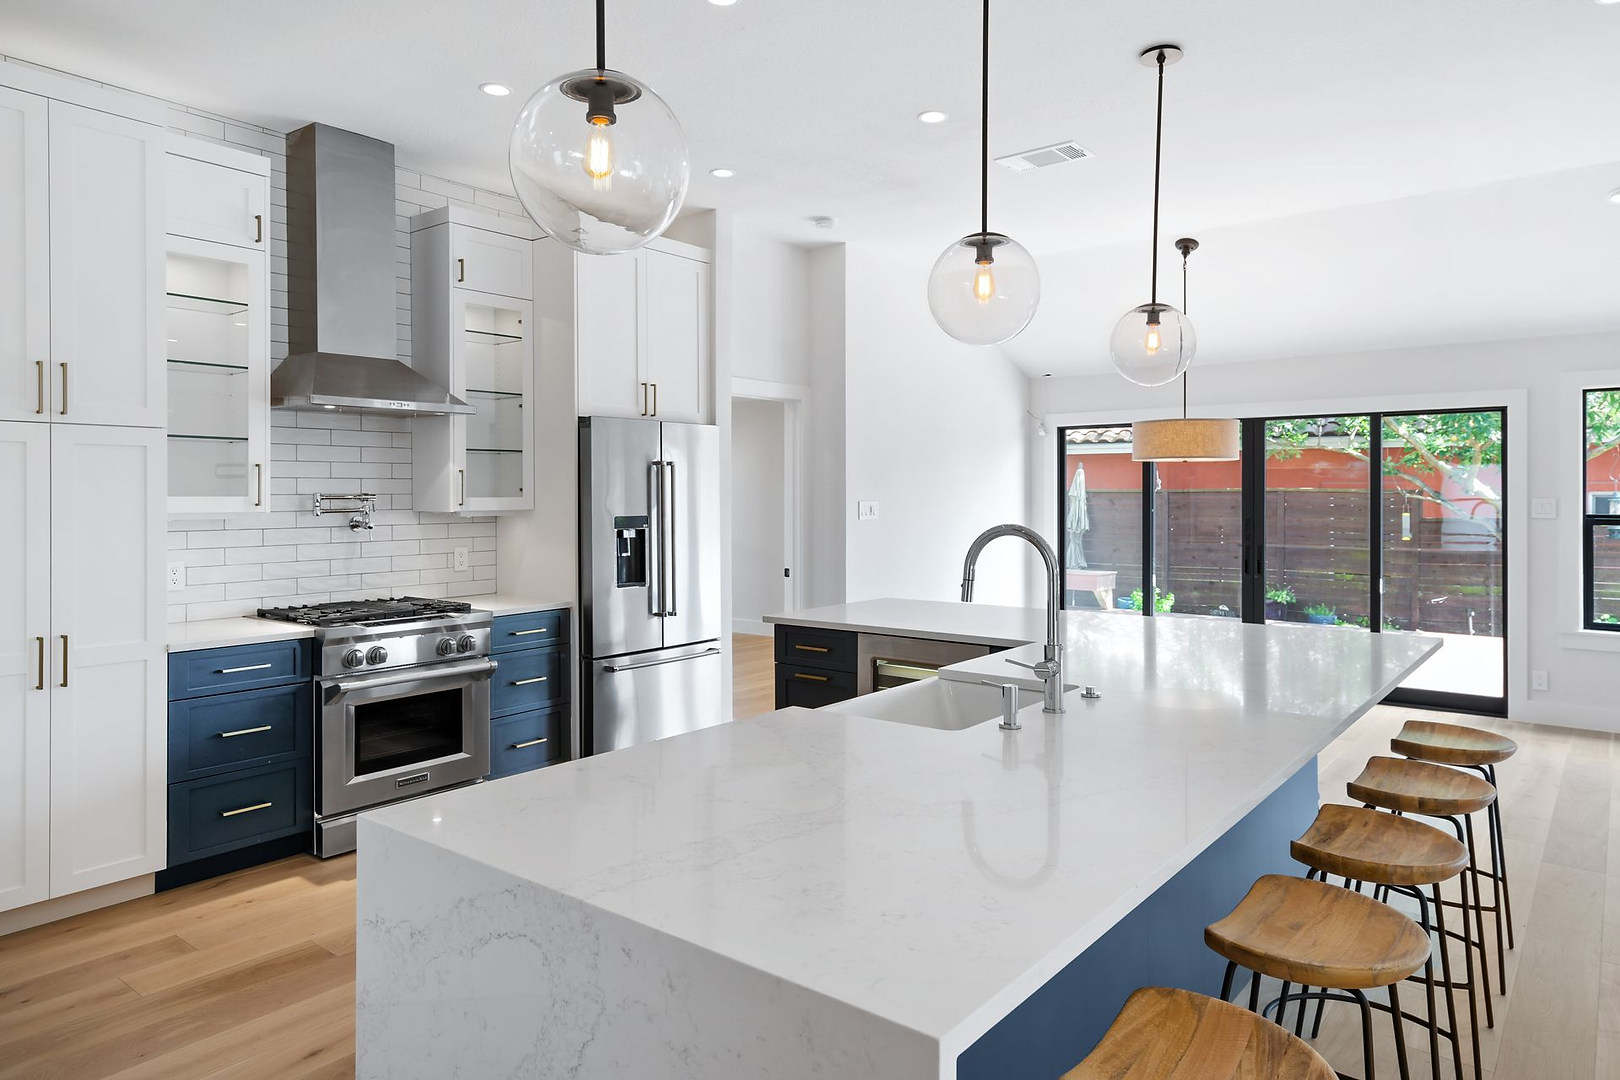 Home Renovation Light Fixtures on Lost Horizon in Austin, TX